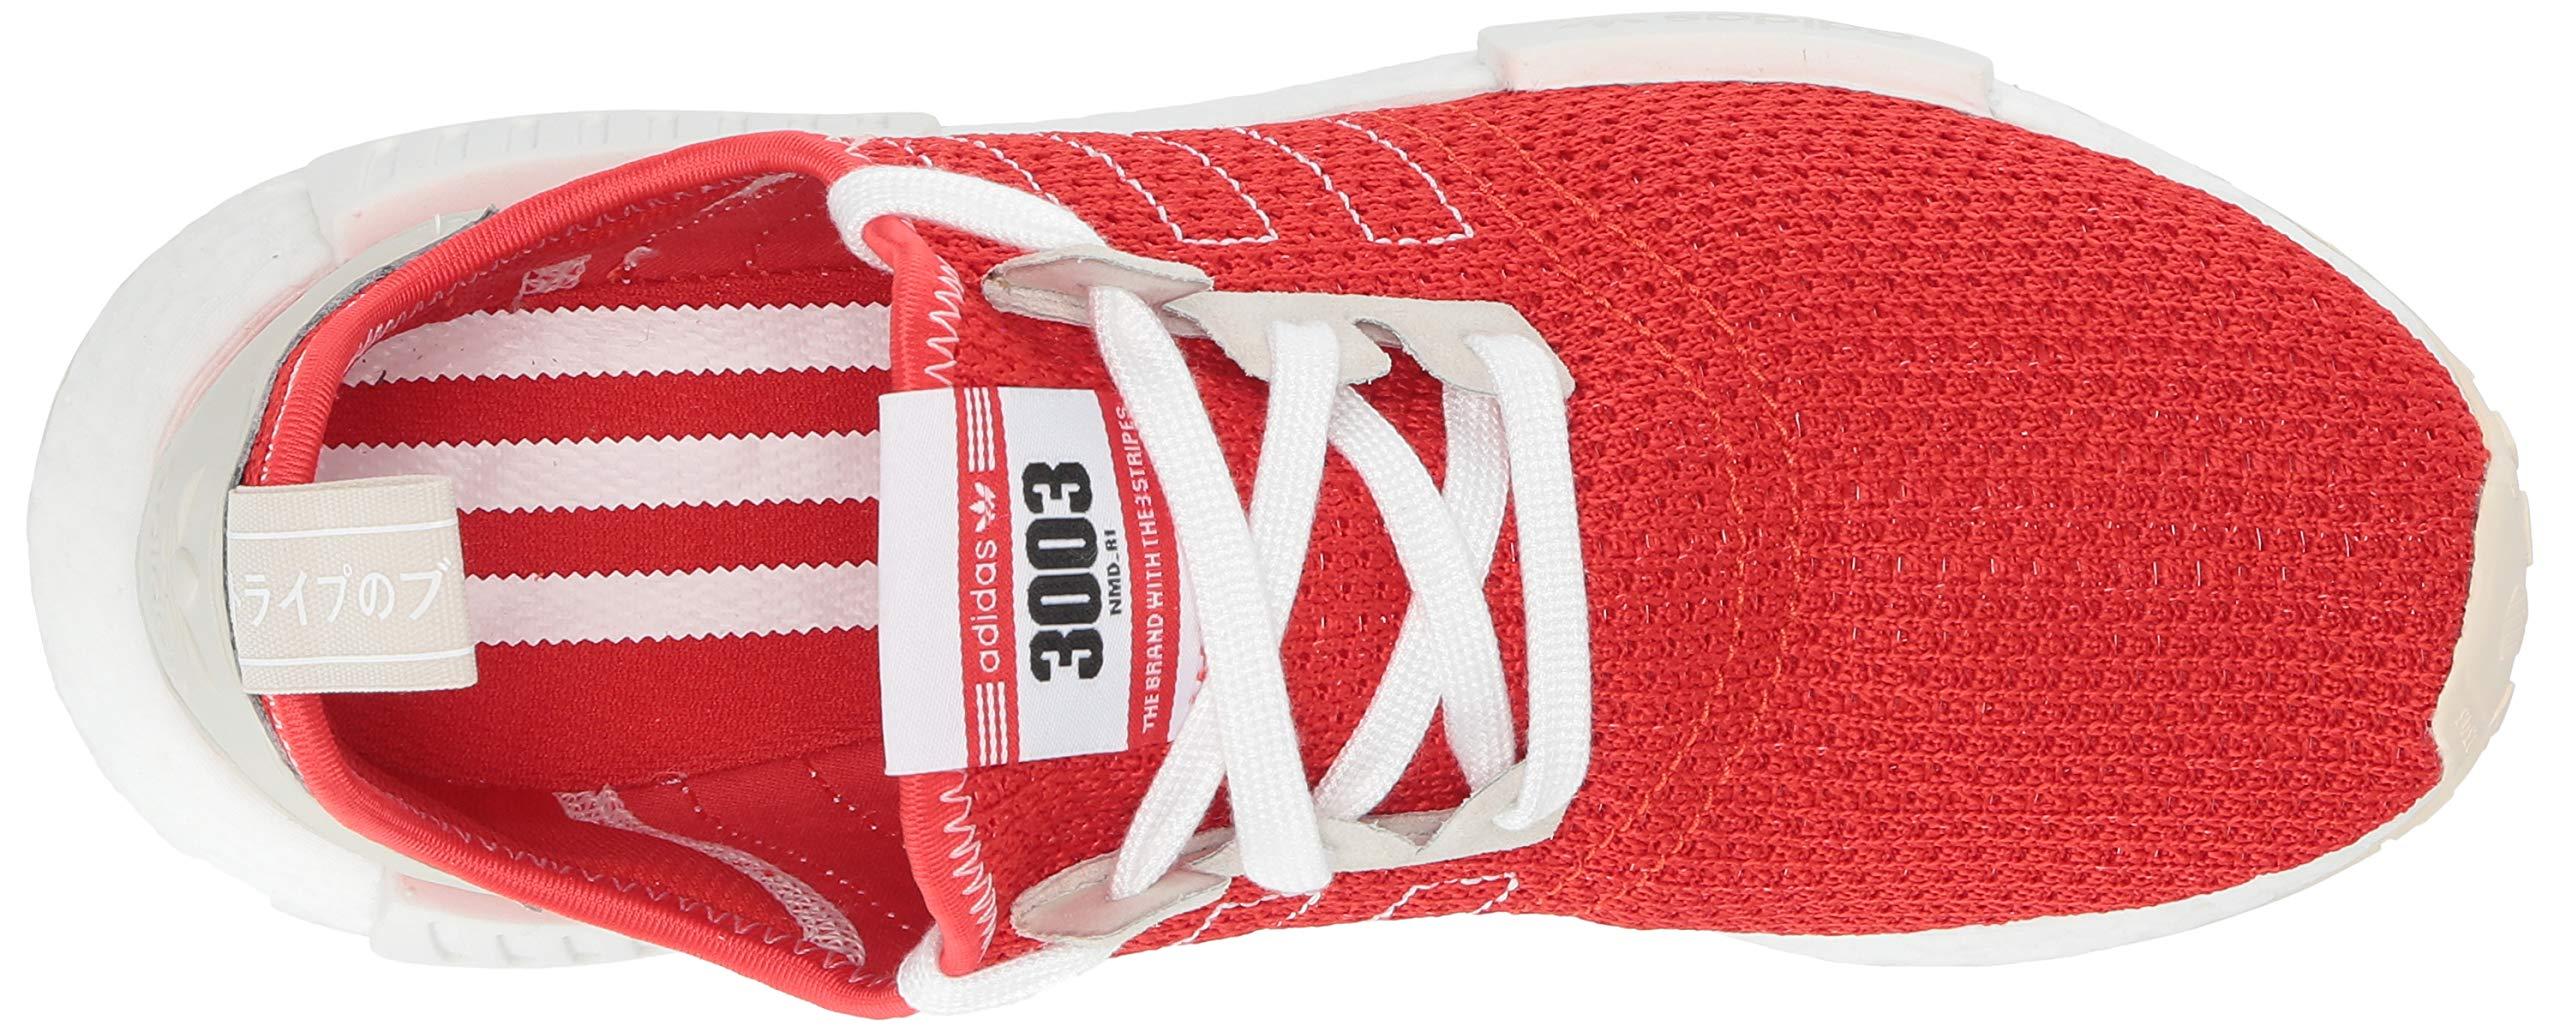 adidas Originals Men's NMD_R1 Running Shoe, Active red/Ecru Tint, 4 M US by adidas Originals (Image #8)